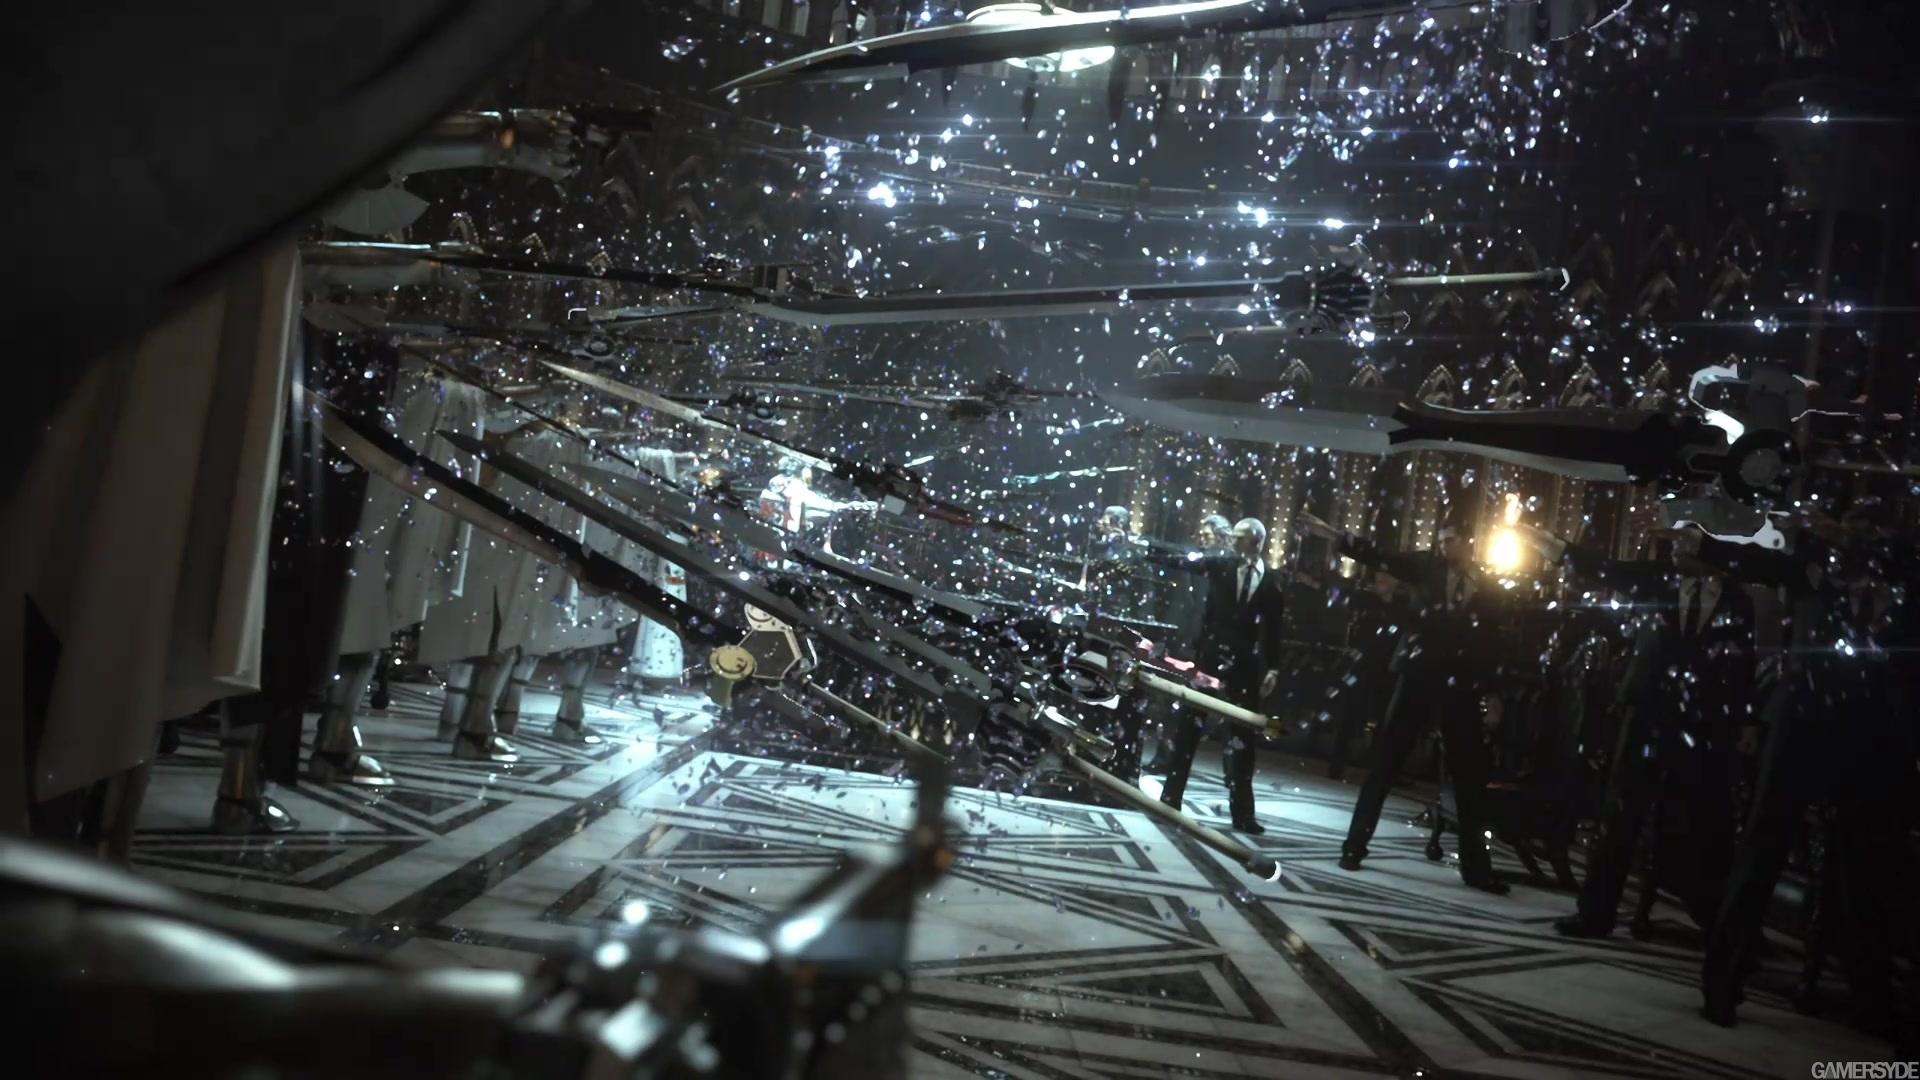 Final Fantasy Xv Wallpaper: Final Fantasy 15 Wallpapers HD